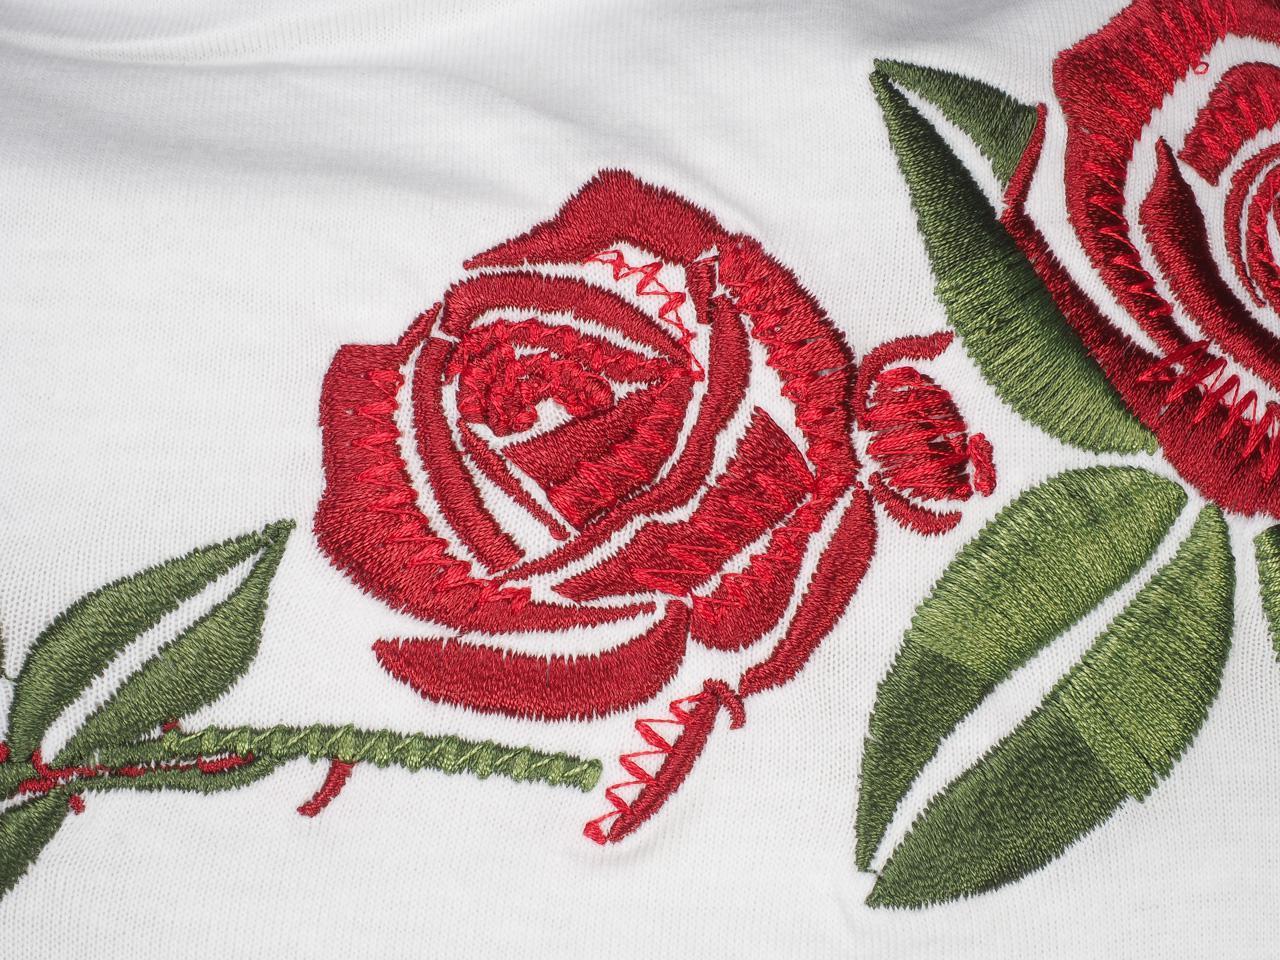 Short-Sleeve-T-Shirt-Hite-Couture-Madiner-White-Mc-Tee-White-11526-New thumbnail 3